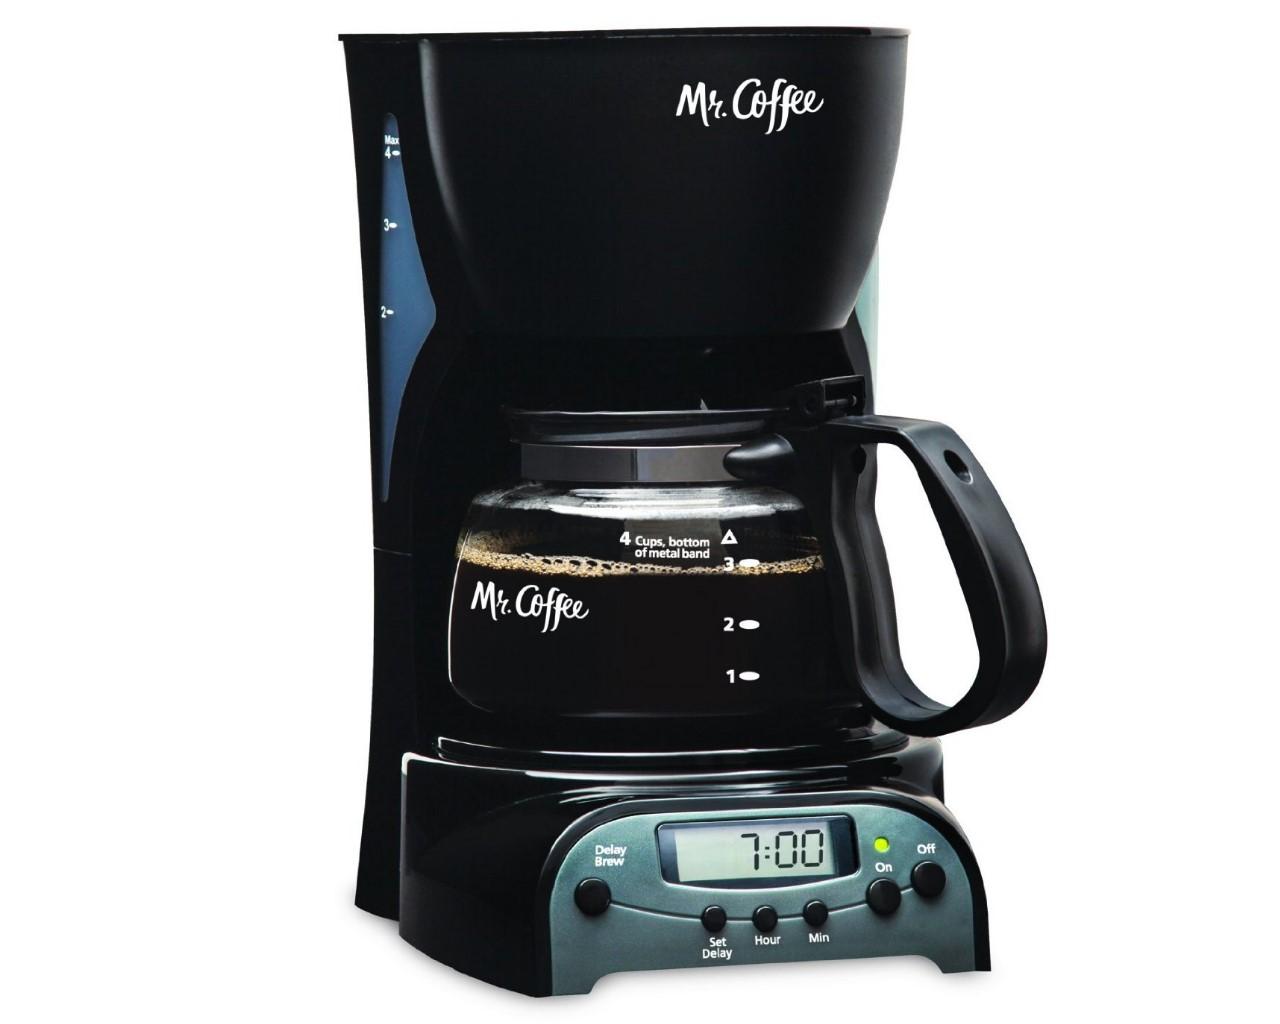 Mr. Coffee DRX5 4-Cup Programmable Coffeemaker, Black